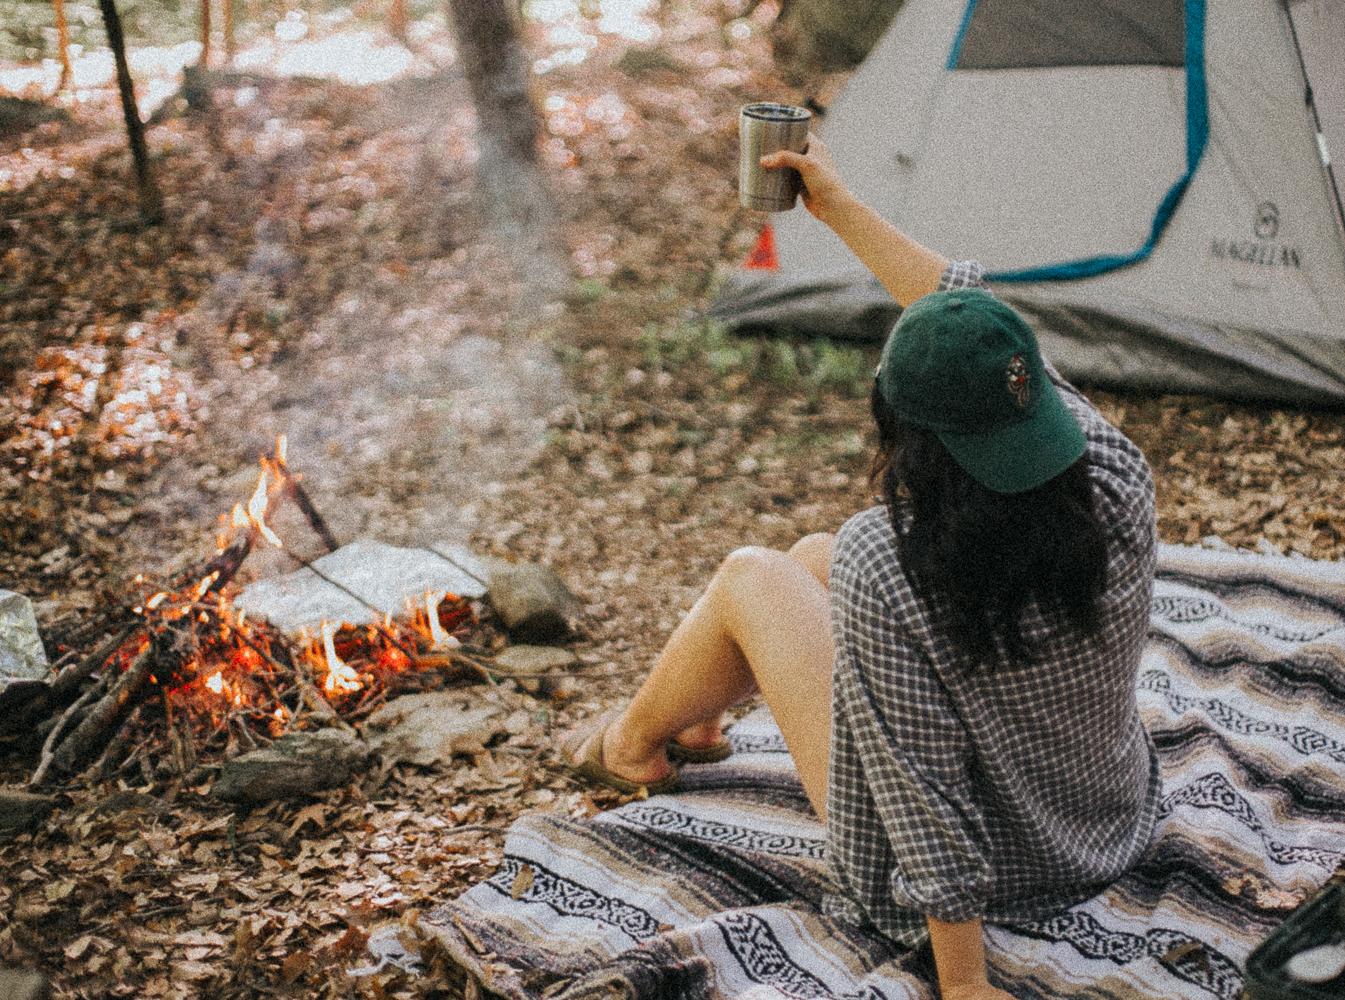 camping, nc lifestyle blogger, nc photographer, North Carolina camping, camping aesthetic